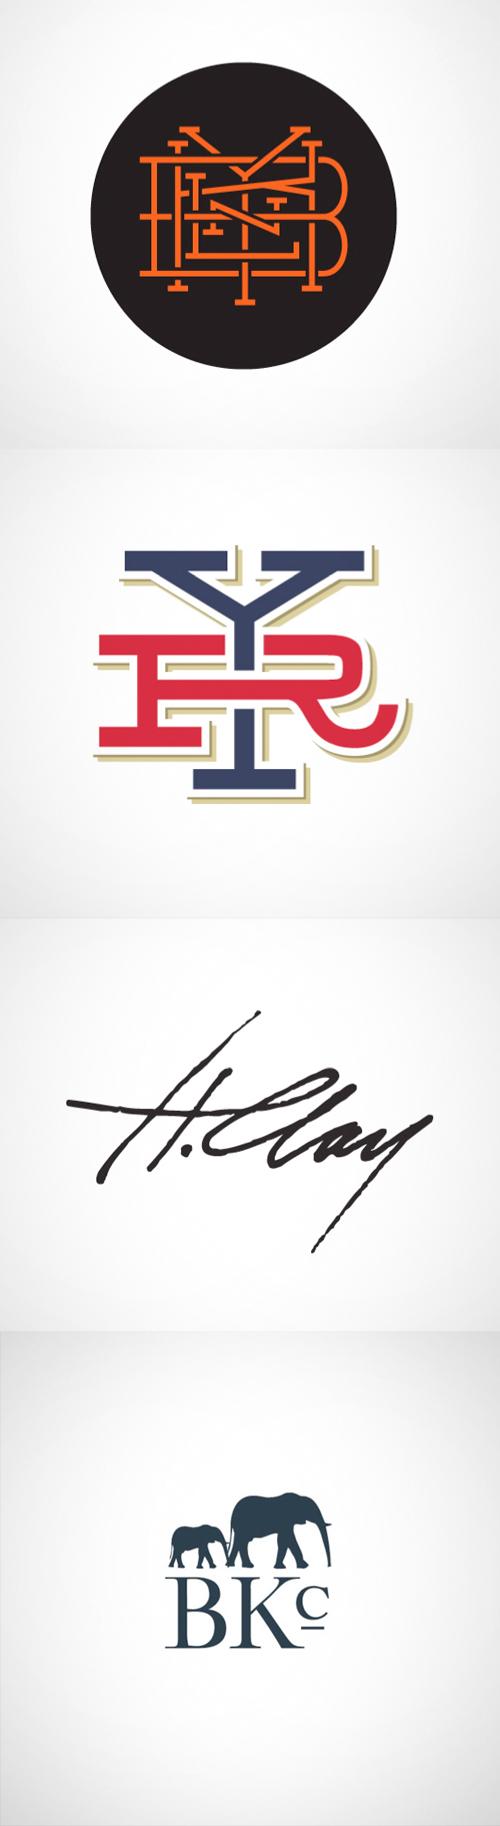 TheeBlog-ONETWENTYSIX_logos